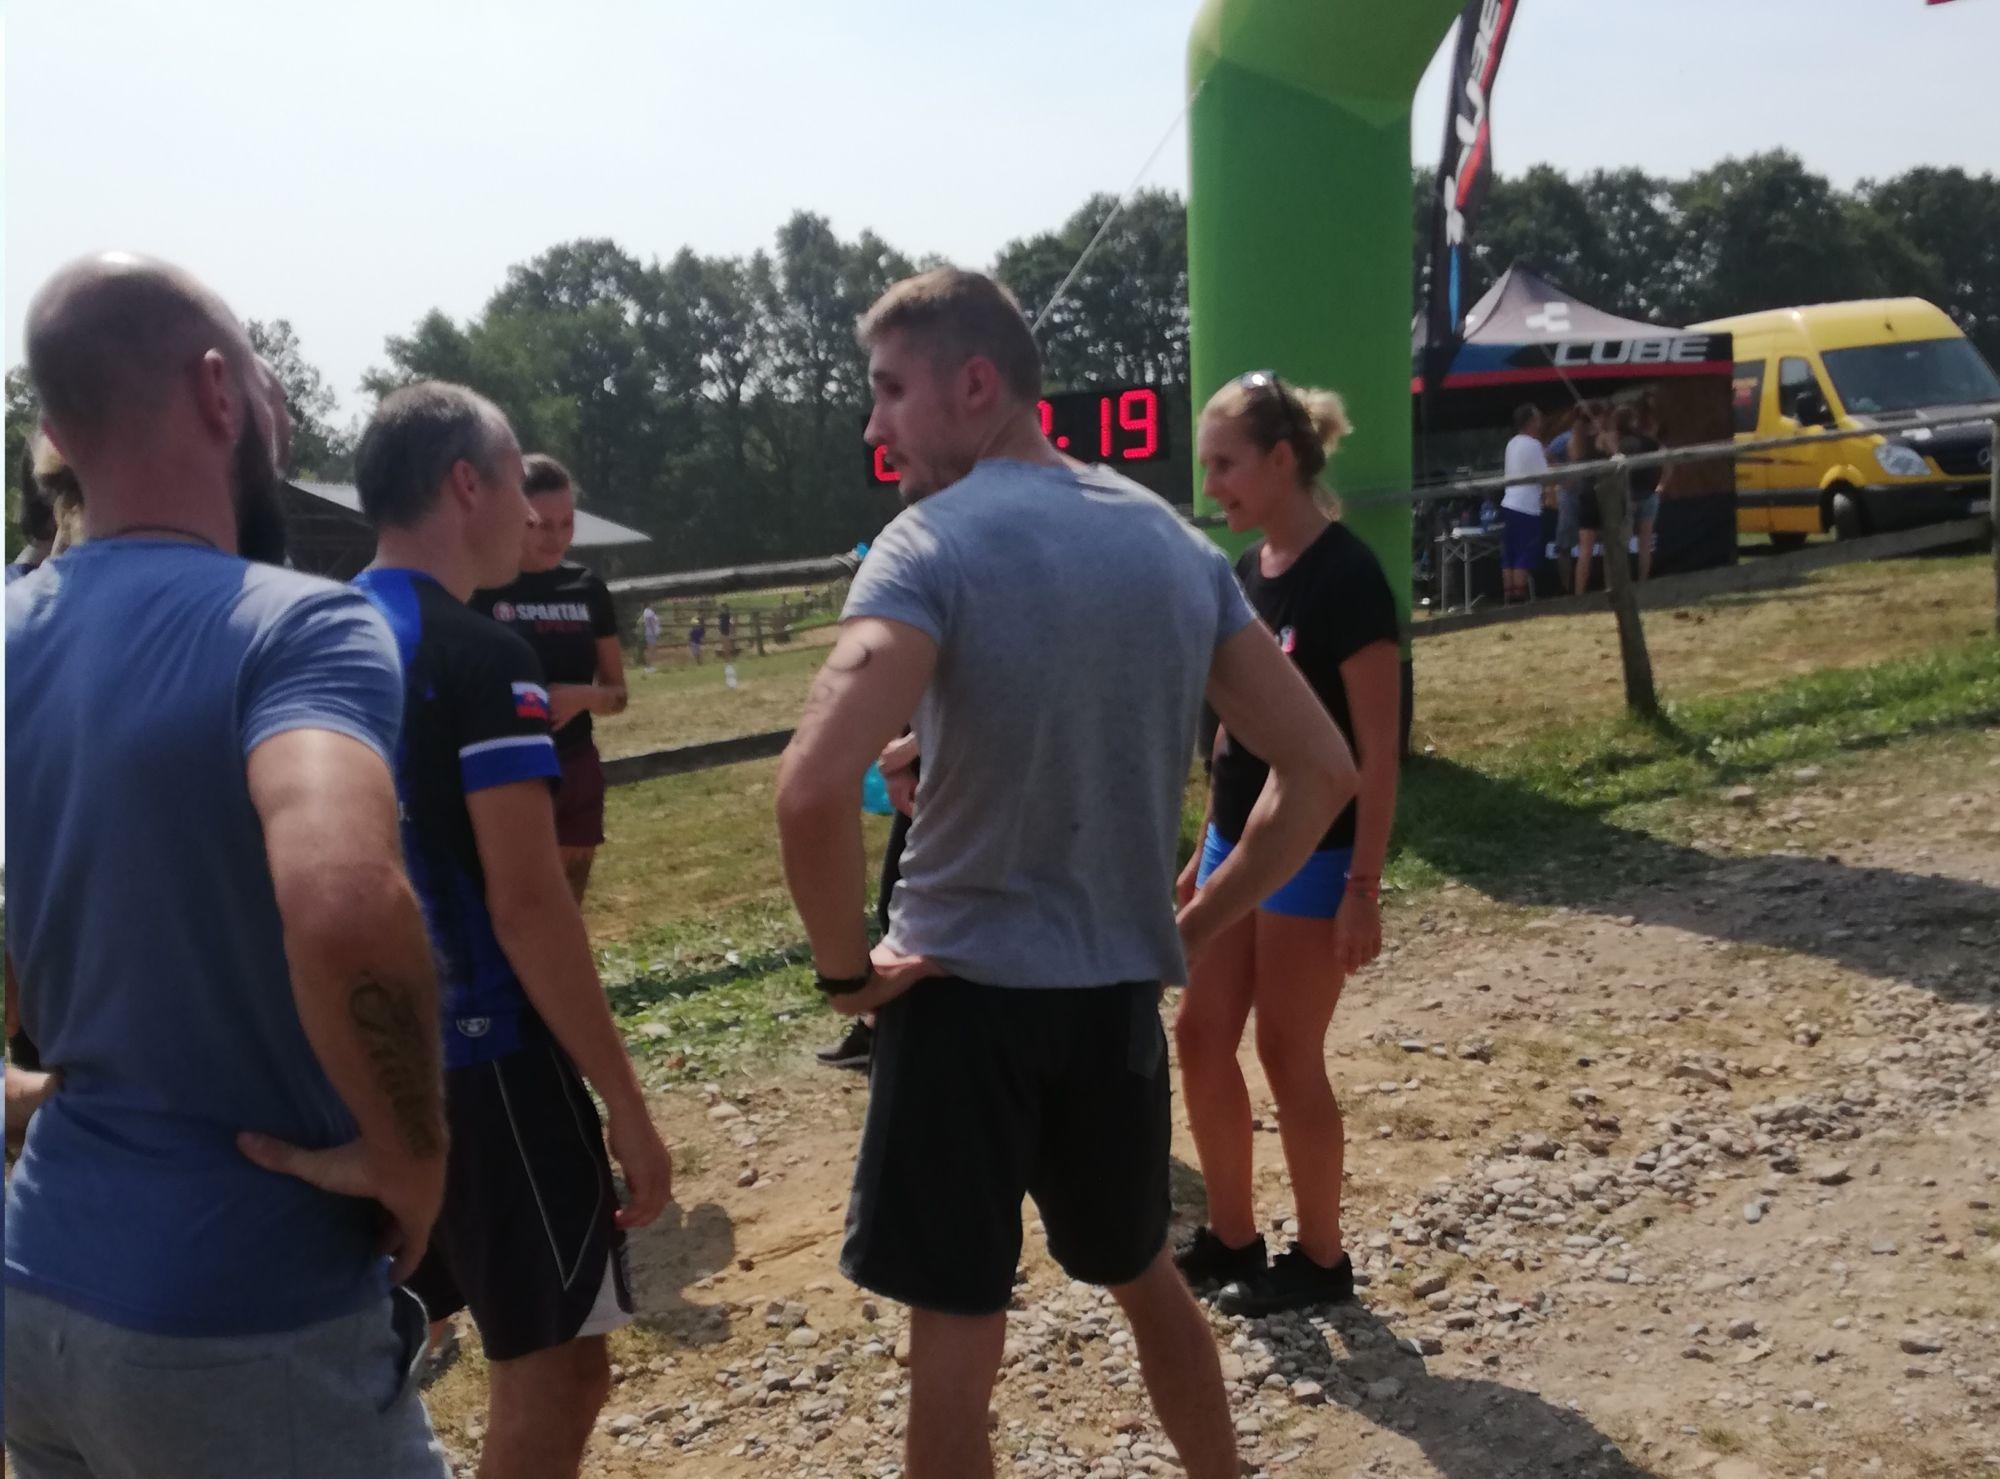 jaroslav lachký coaching trener mitochondria trening strava poradca mitochondria služby